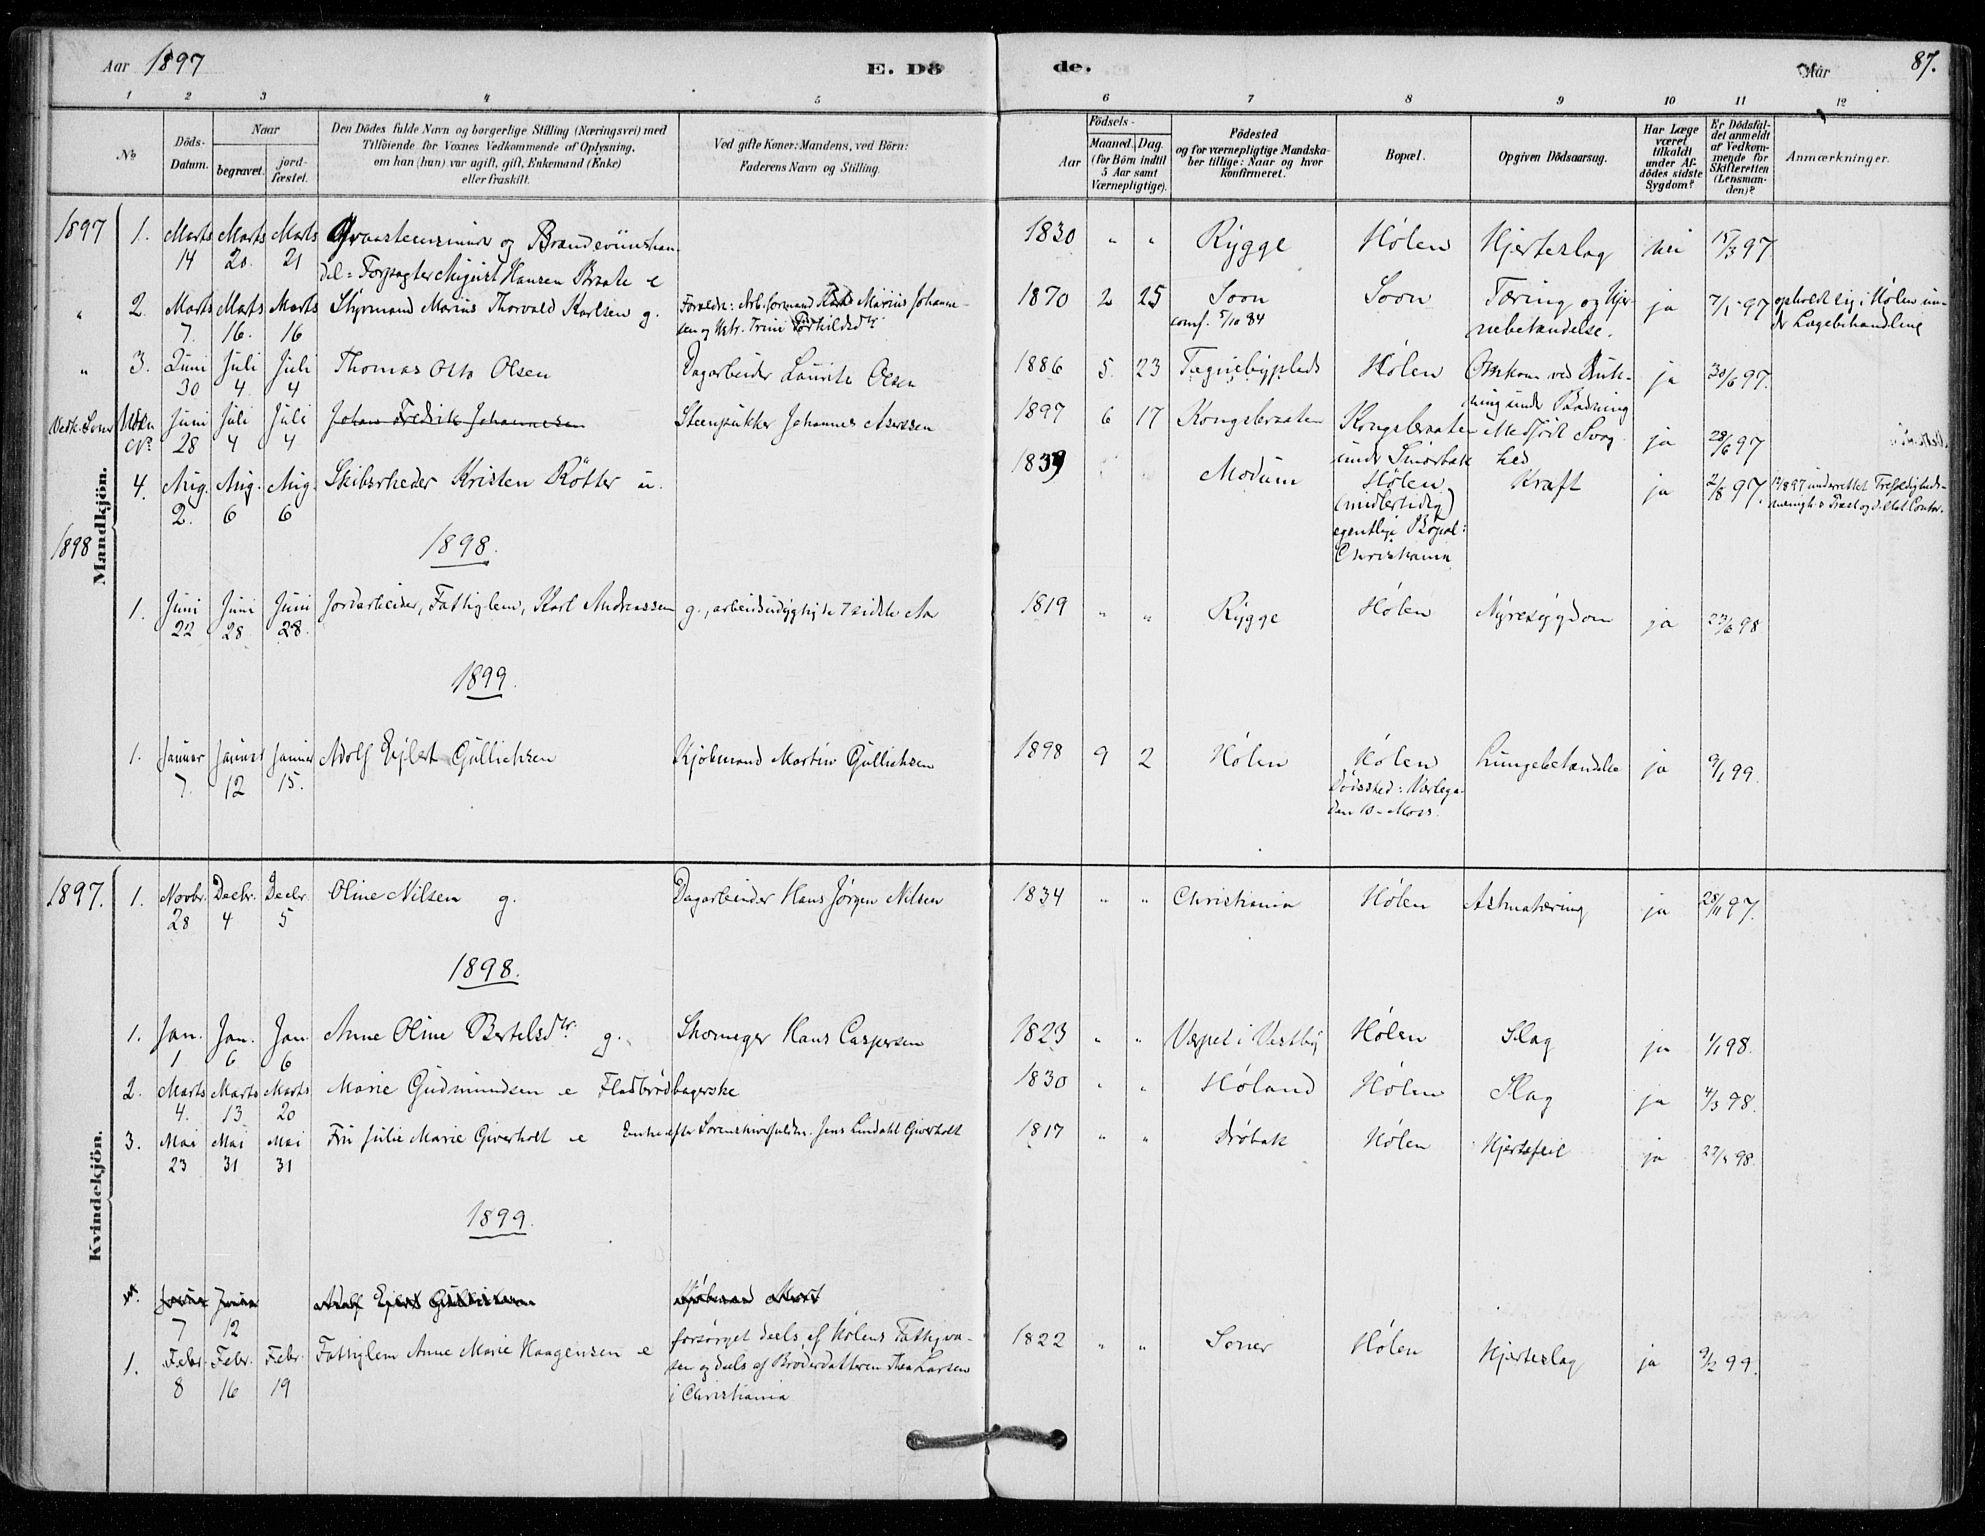 SAO, Vestby prestekontor Kirkebøker, F/Fe/L0001: Ministerialbok nr. V 1, 1878-1931, s. 87